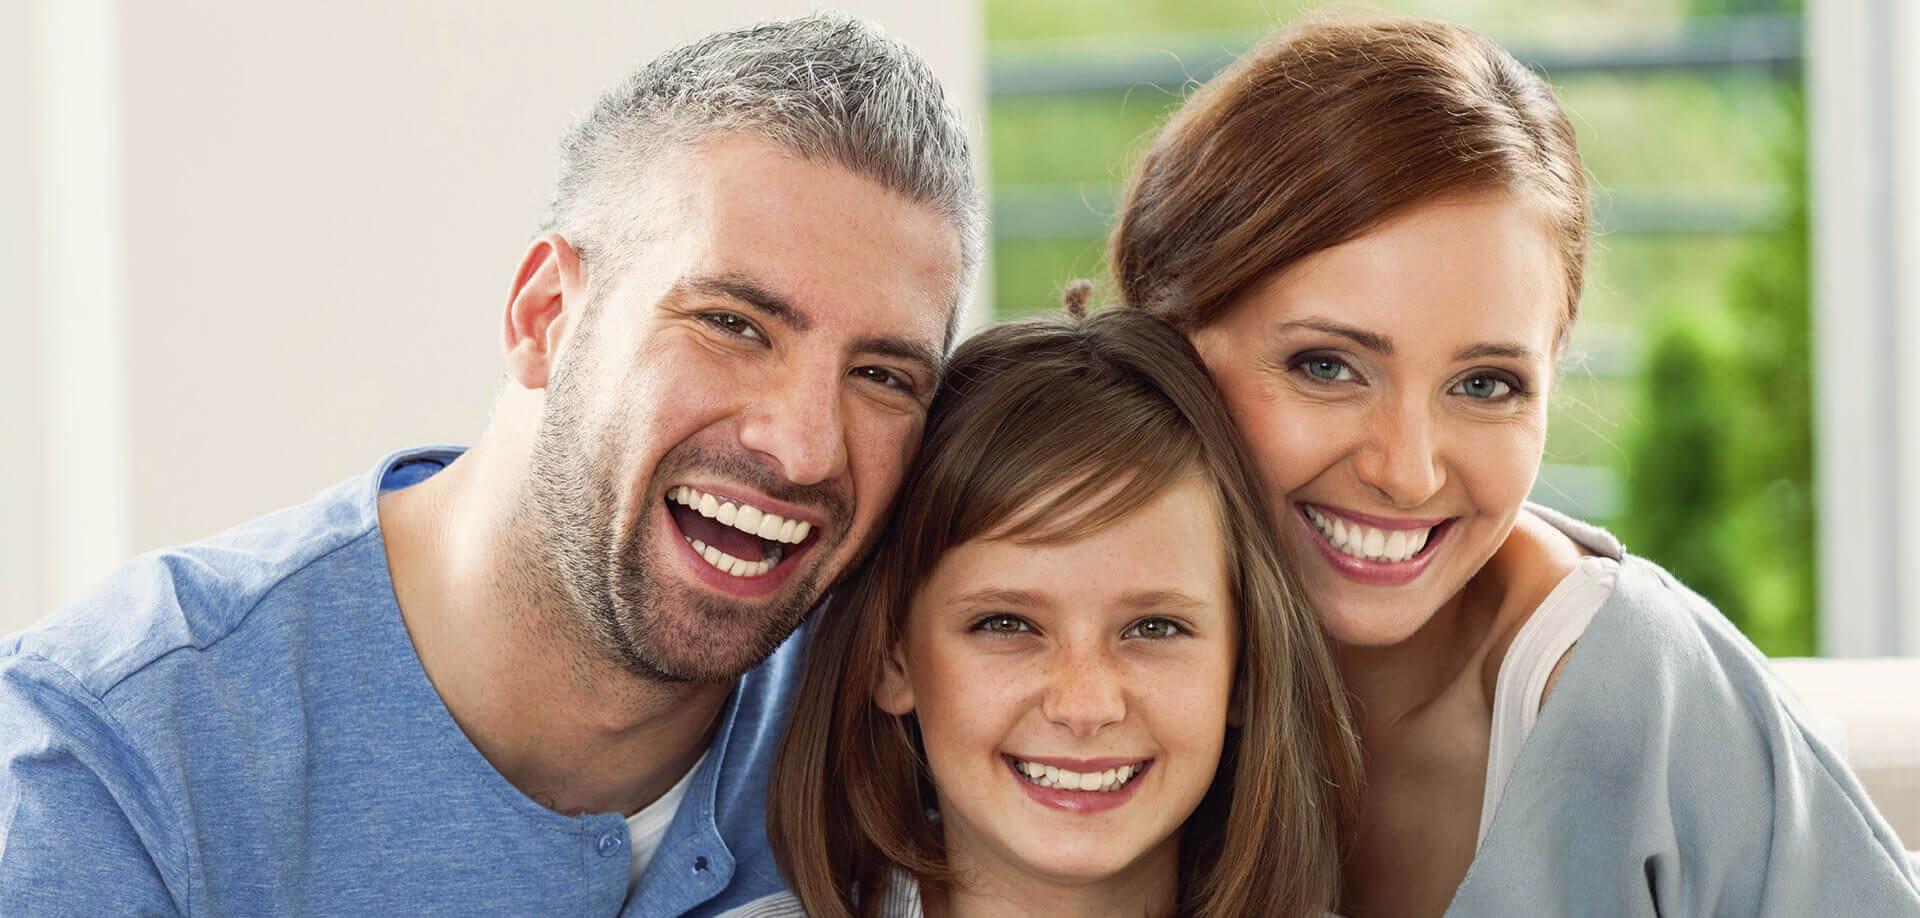 Dentist in Fairfax, VA 22031 | Cosmetic Dentist in Fairfax VA